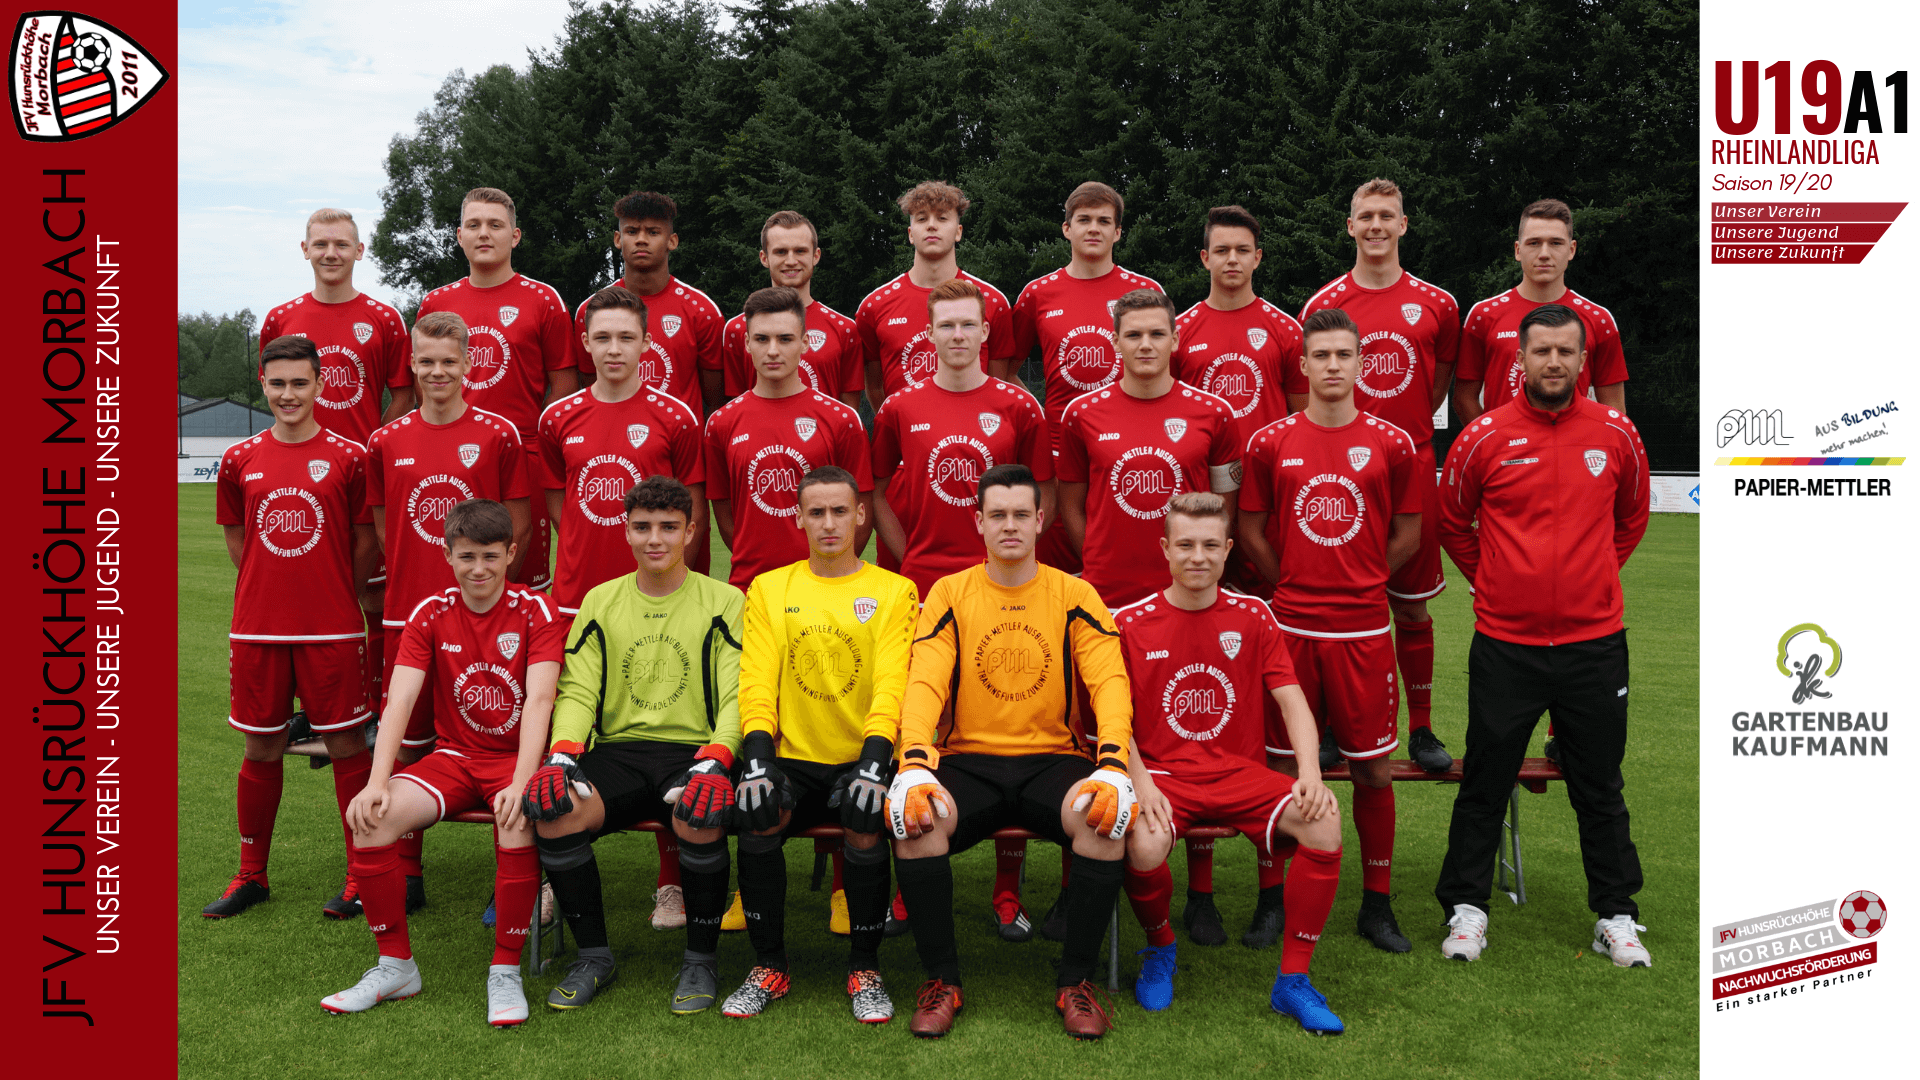 U19 A1: JFV Hunsrückhöhe Morbach – Mosella Schweich 4-1 (1-0)